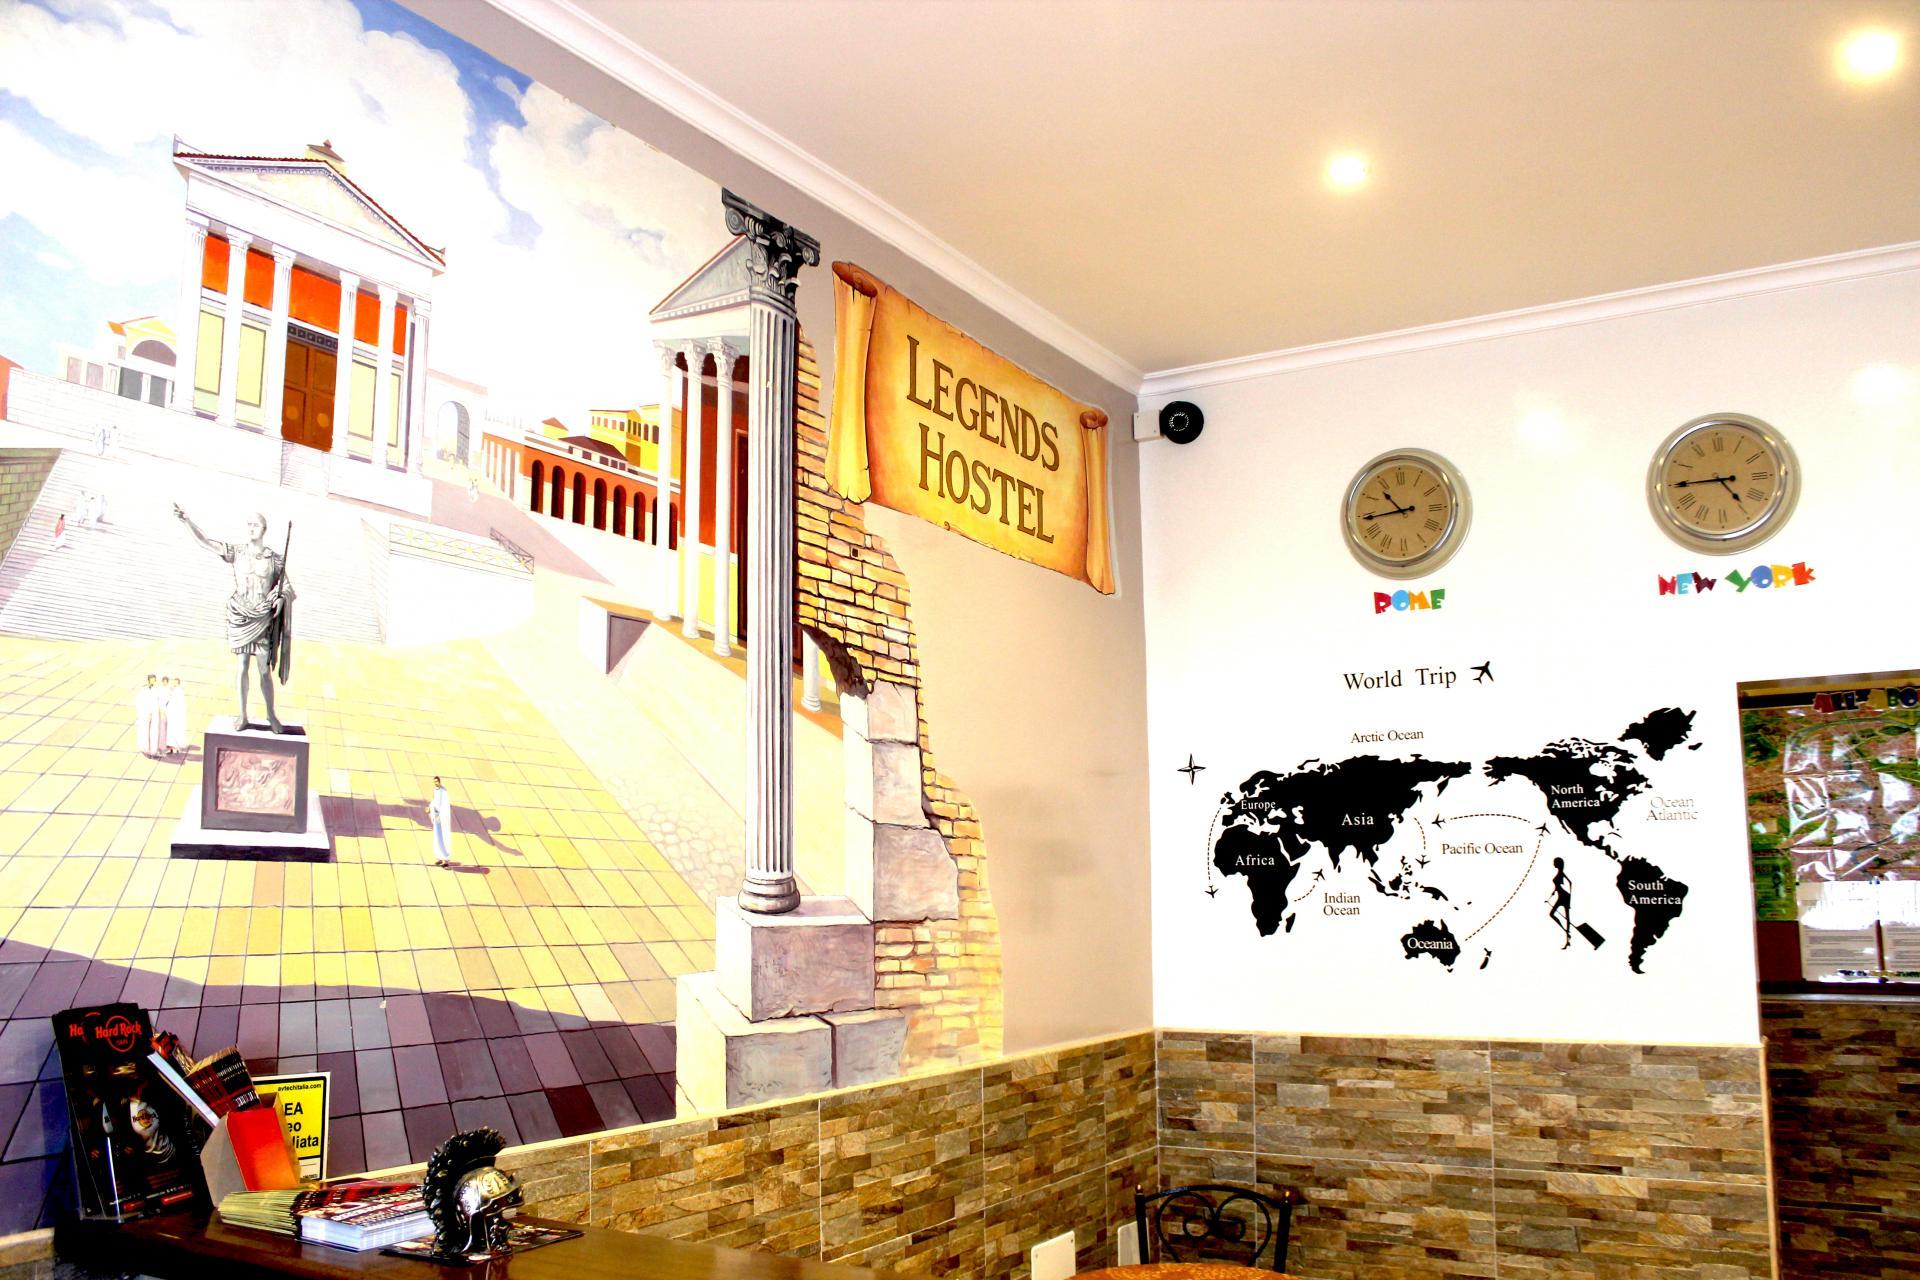 Legends Hostel Rome